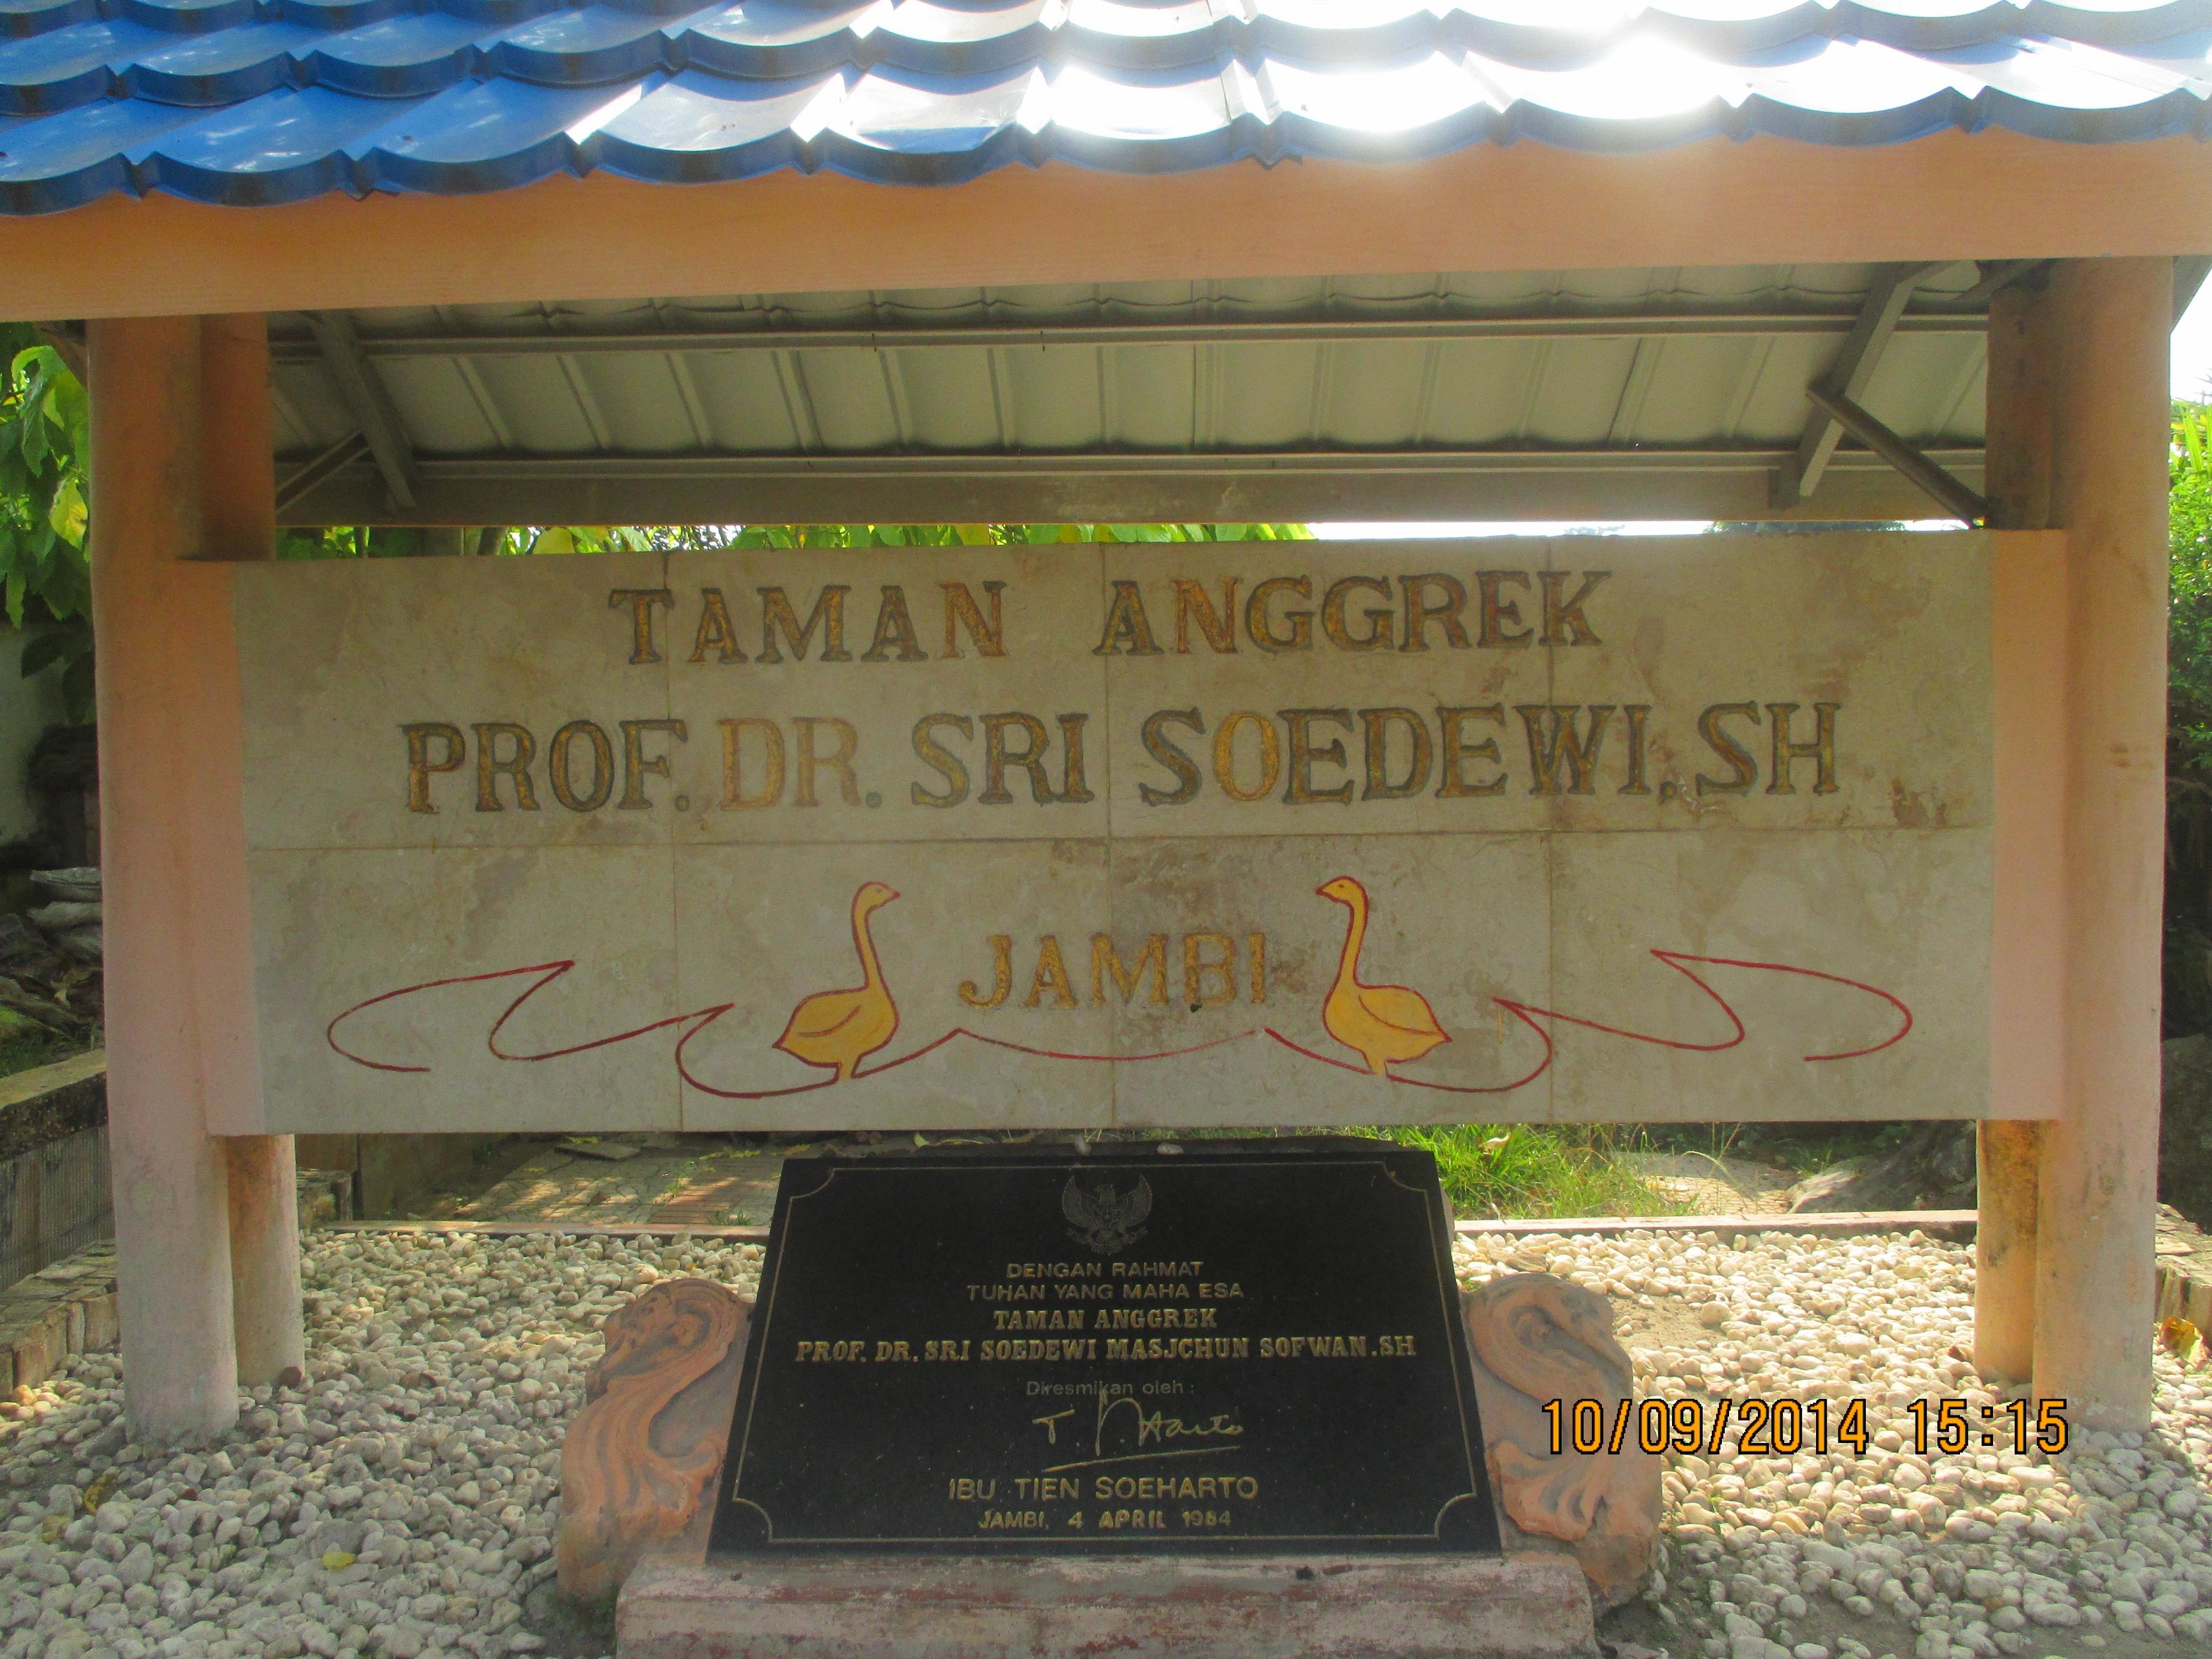 Taman Anggrek Prof Dr Sri Soedewi Sh Jambi Yanmata Memasuki